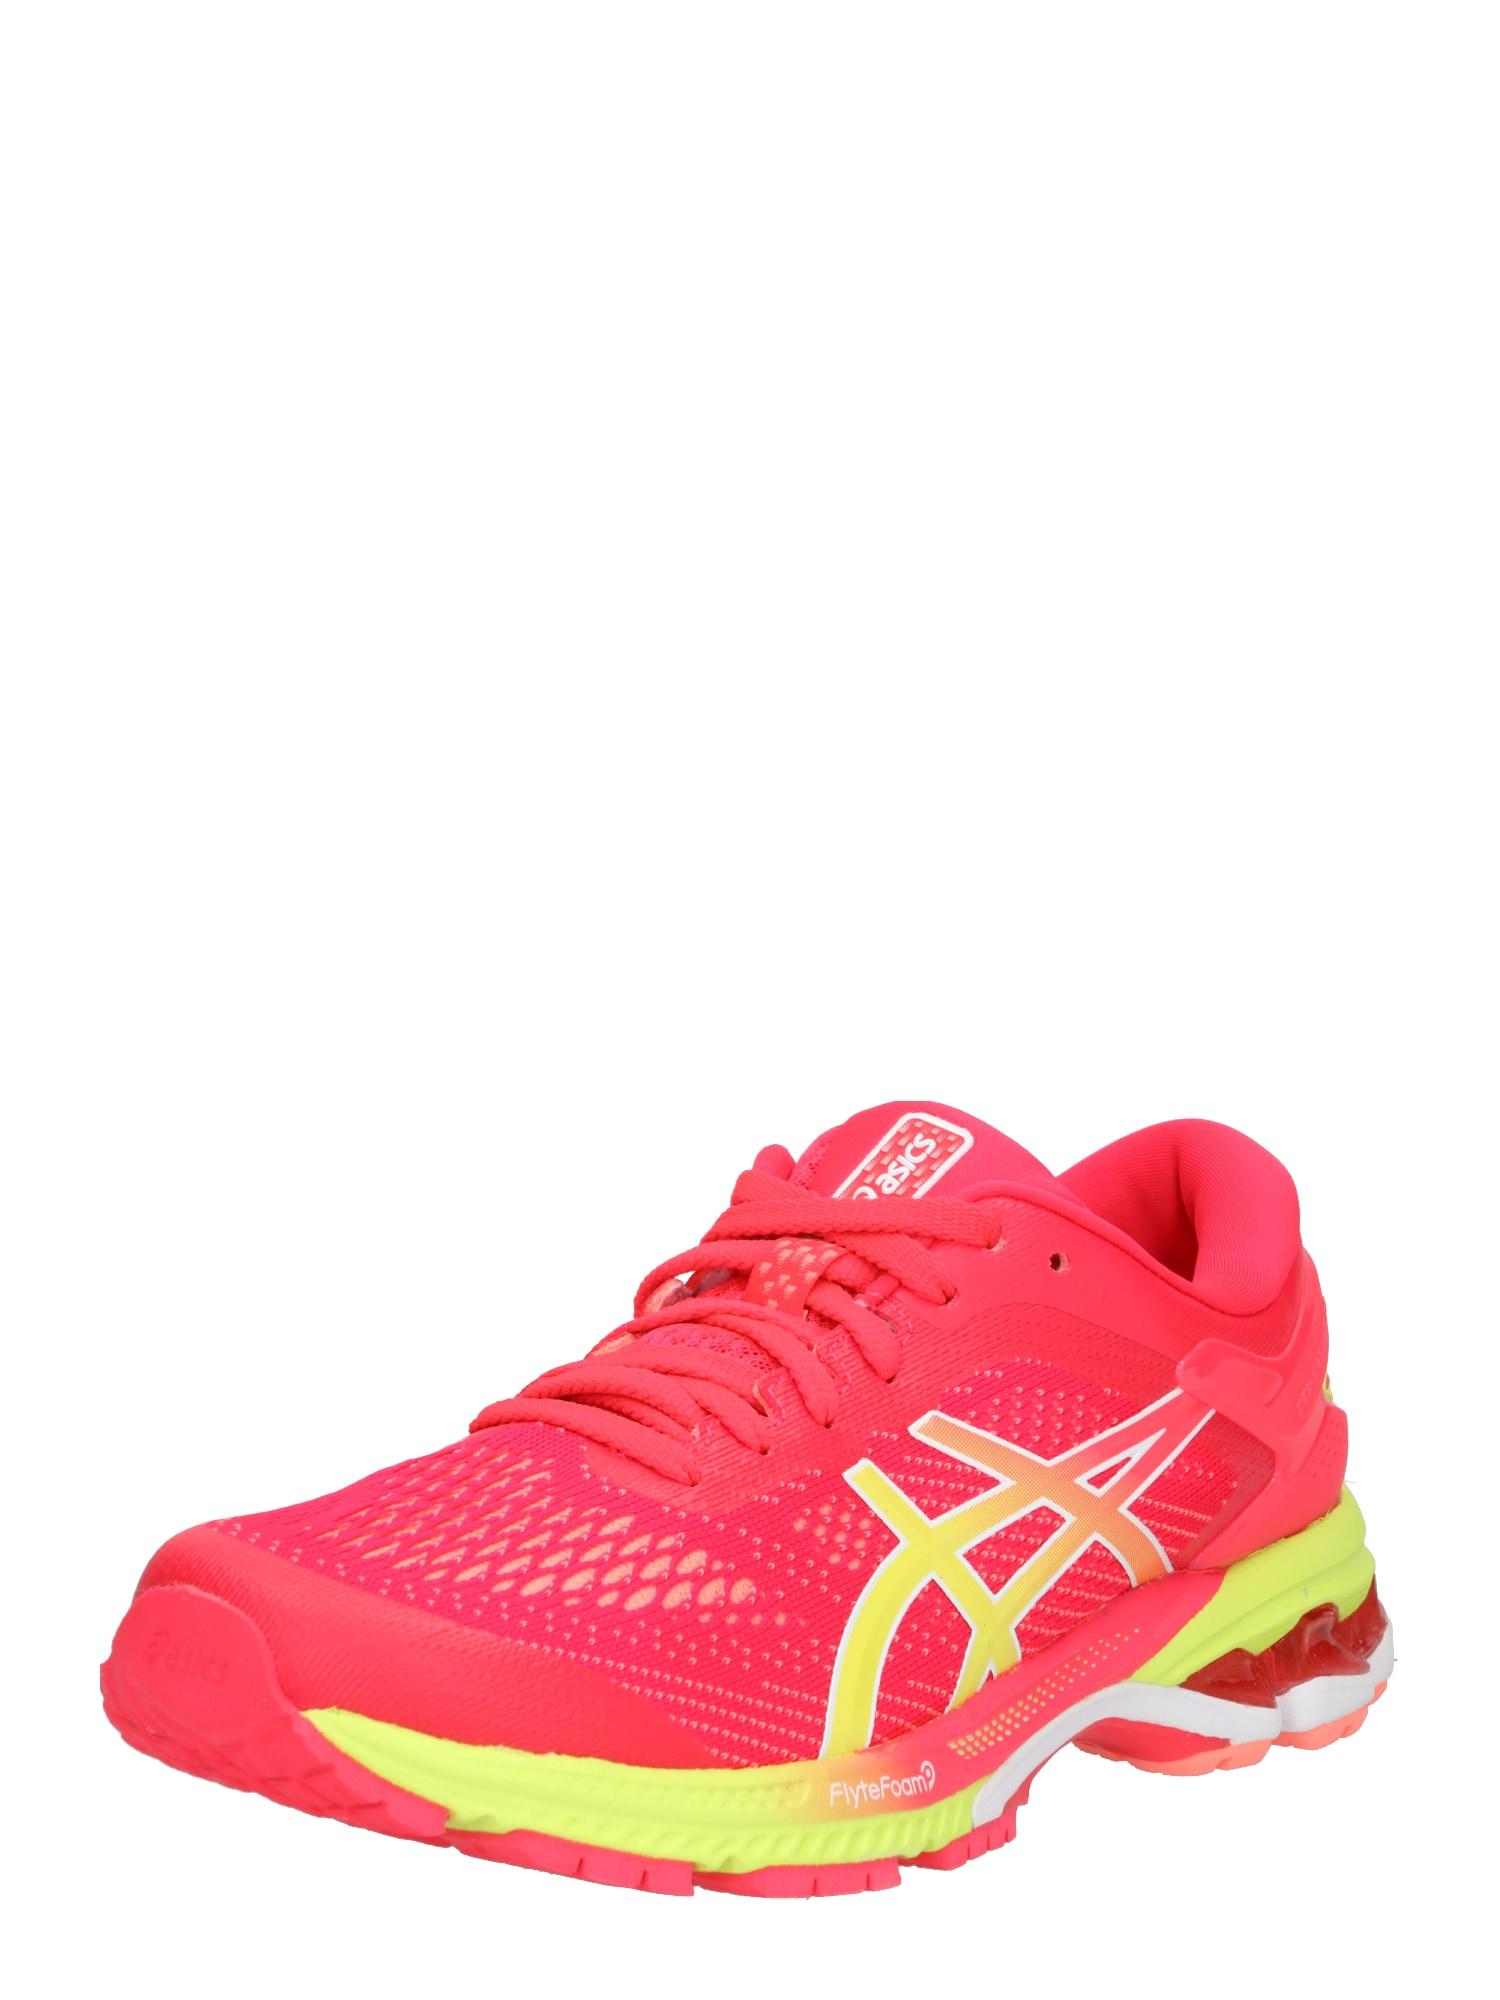 Běžecká obuv GEL-KAYANO 26 žlutá pink ASICS